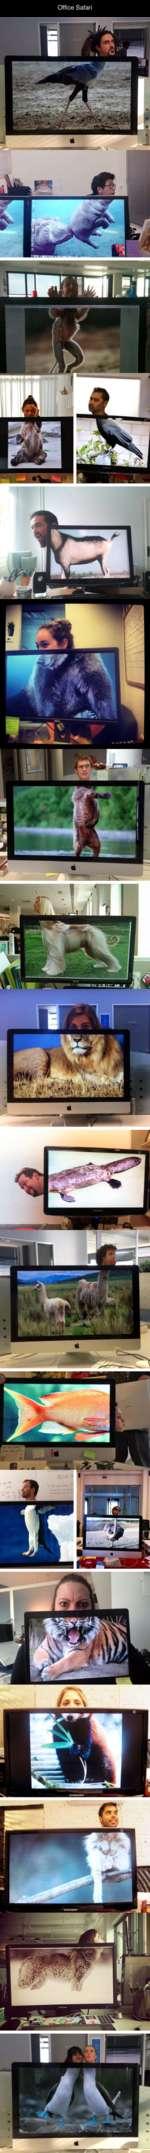 Office Safari